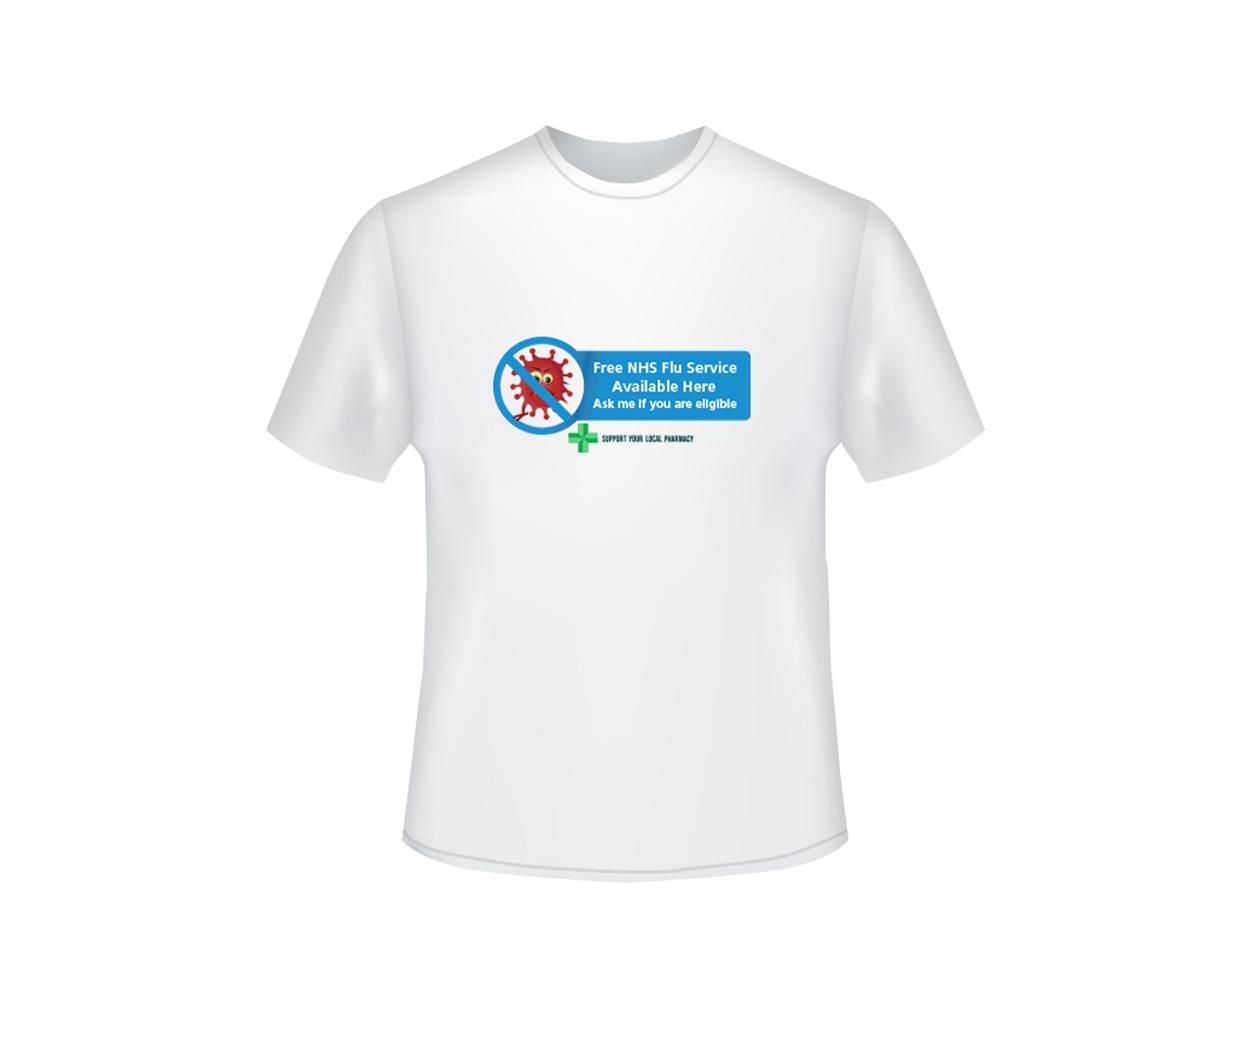 Flu T-Shirt EMBLEM470366